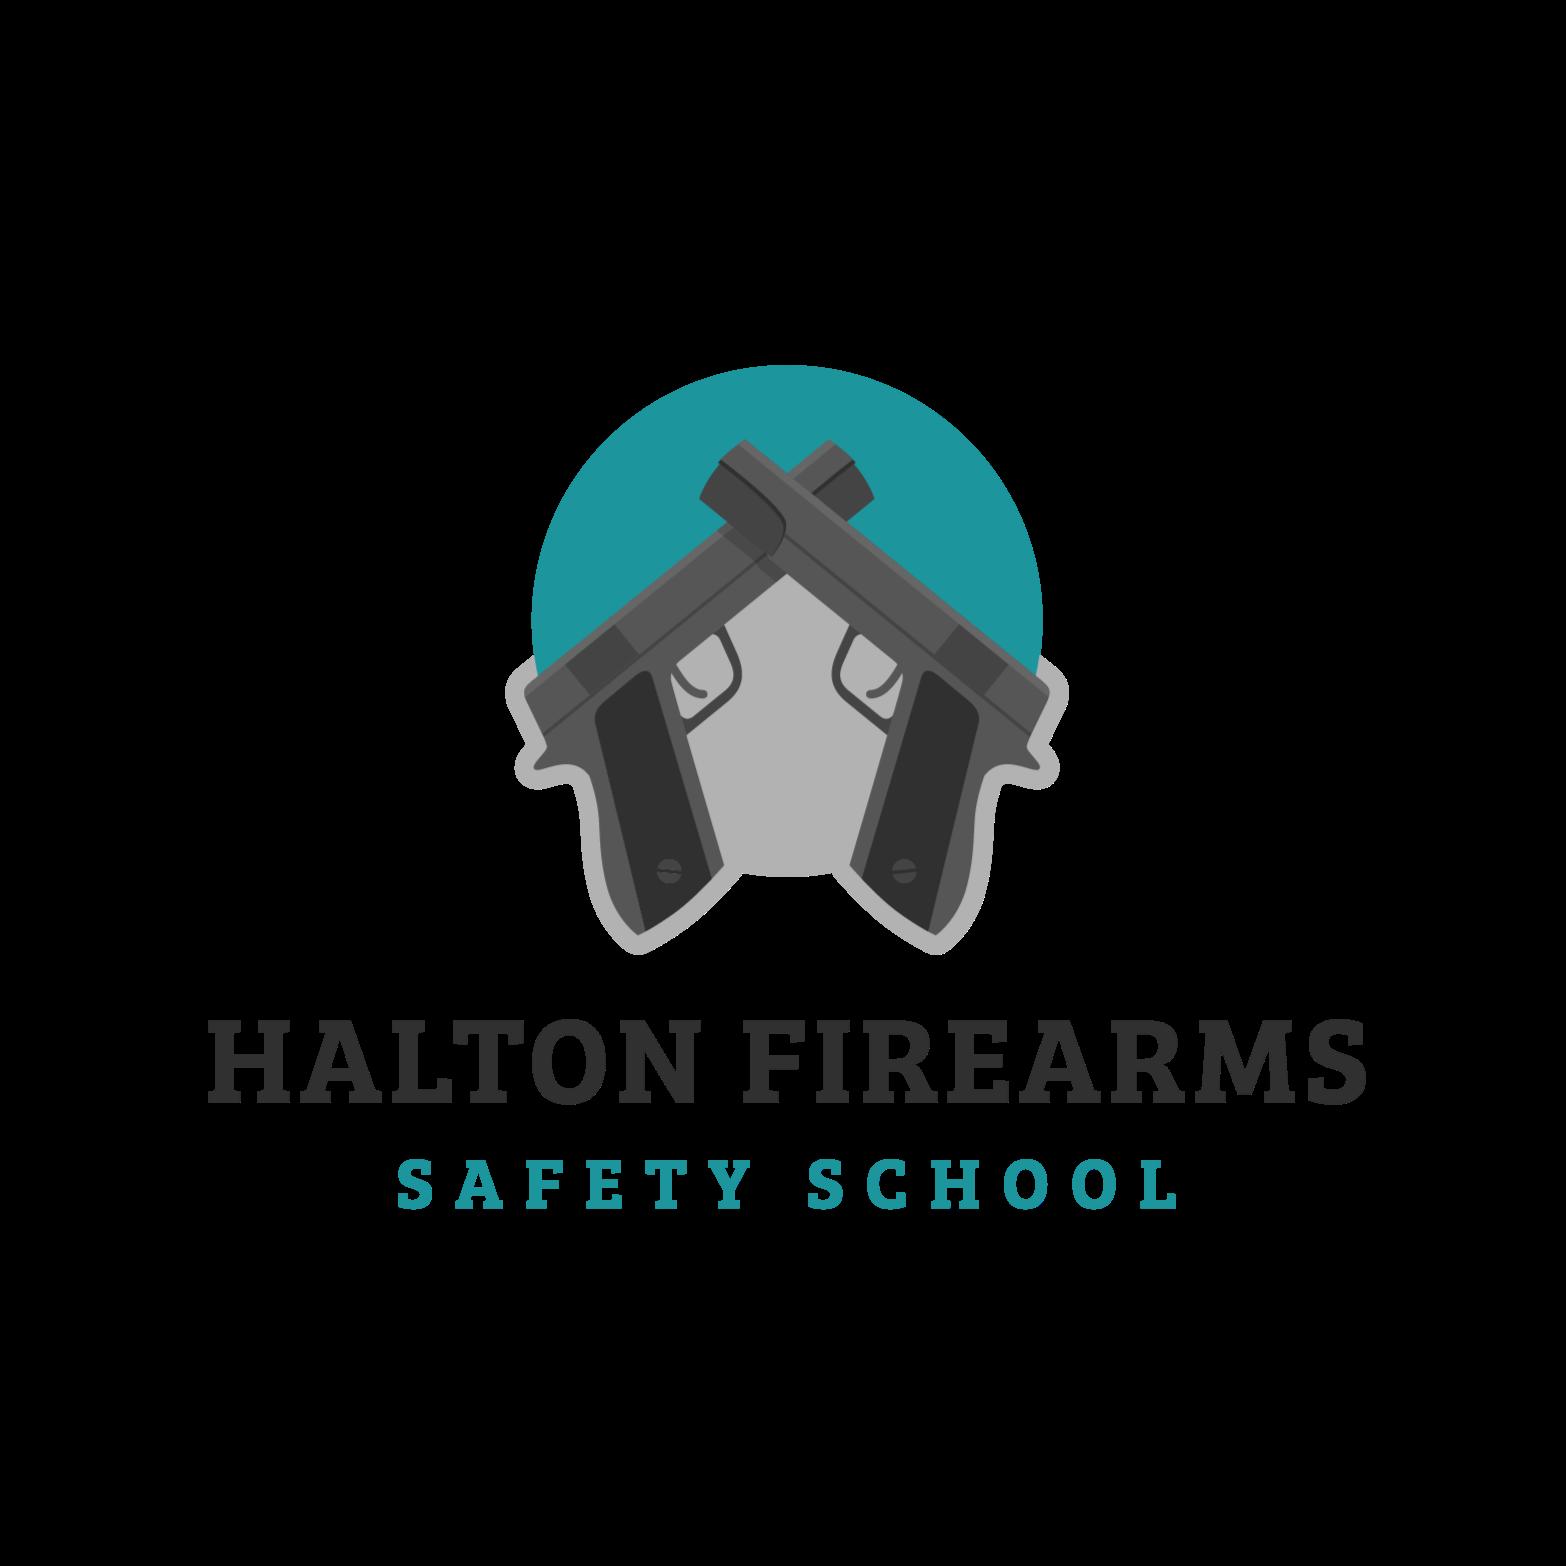 Halton Firearms Safety School